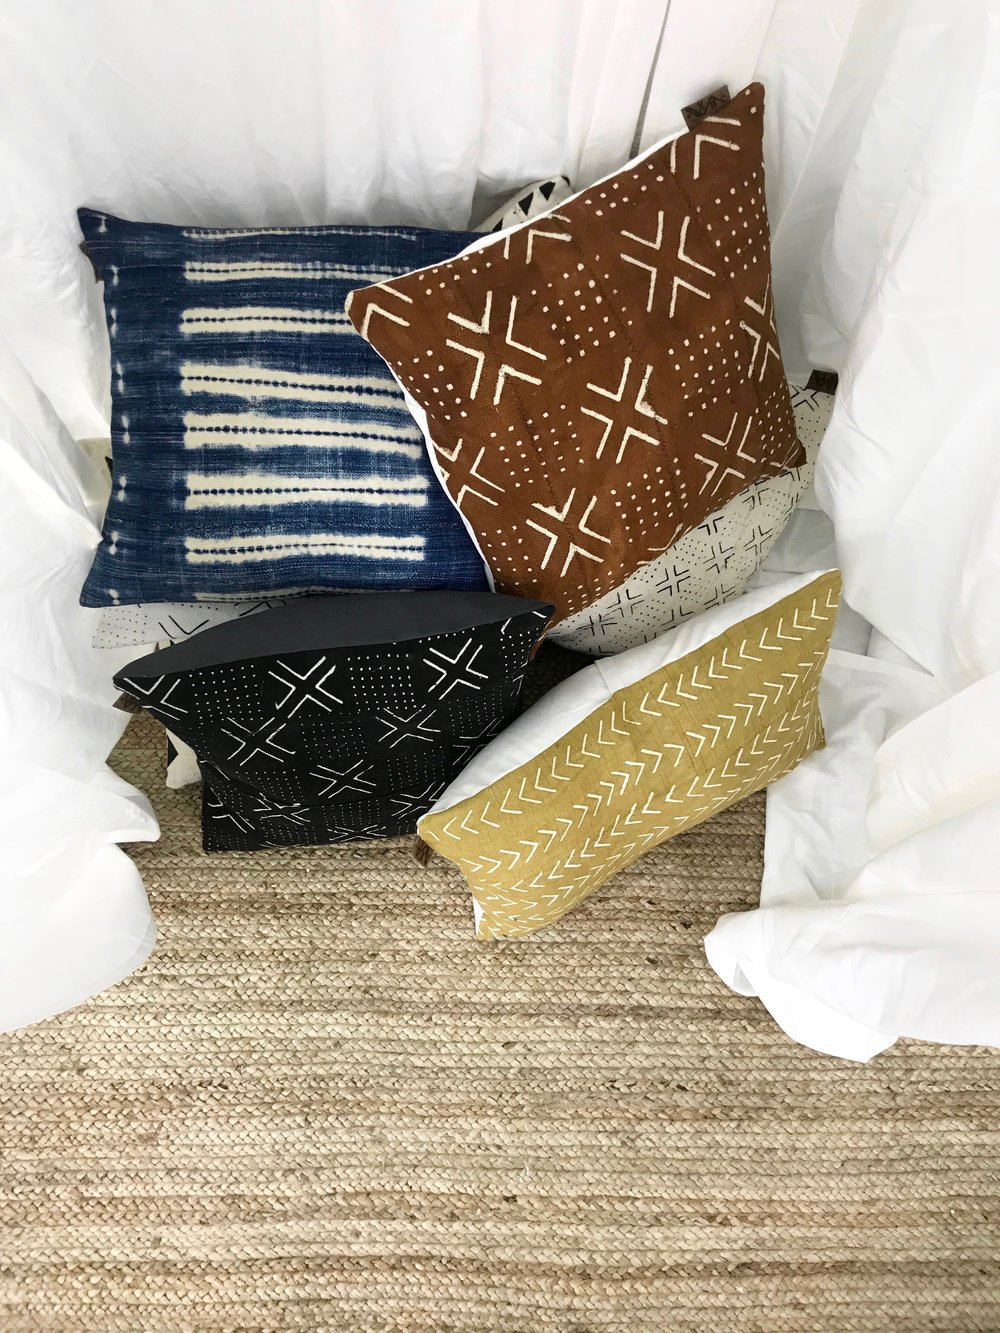 xNasozi Decorative Pillows are so inviting! - Photo credit: xNasozi